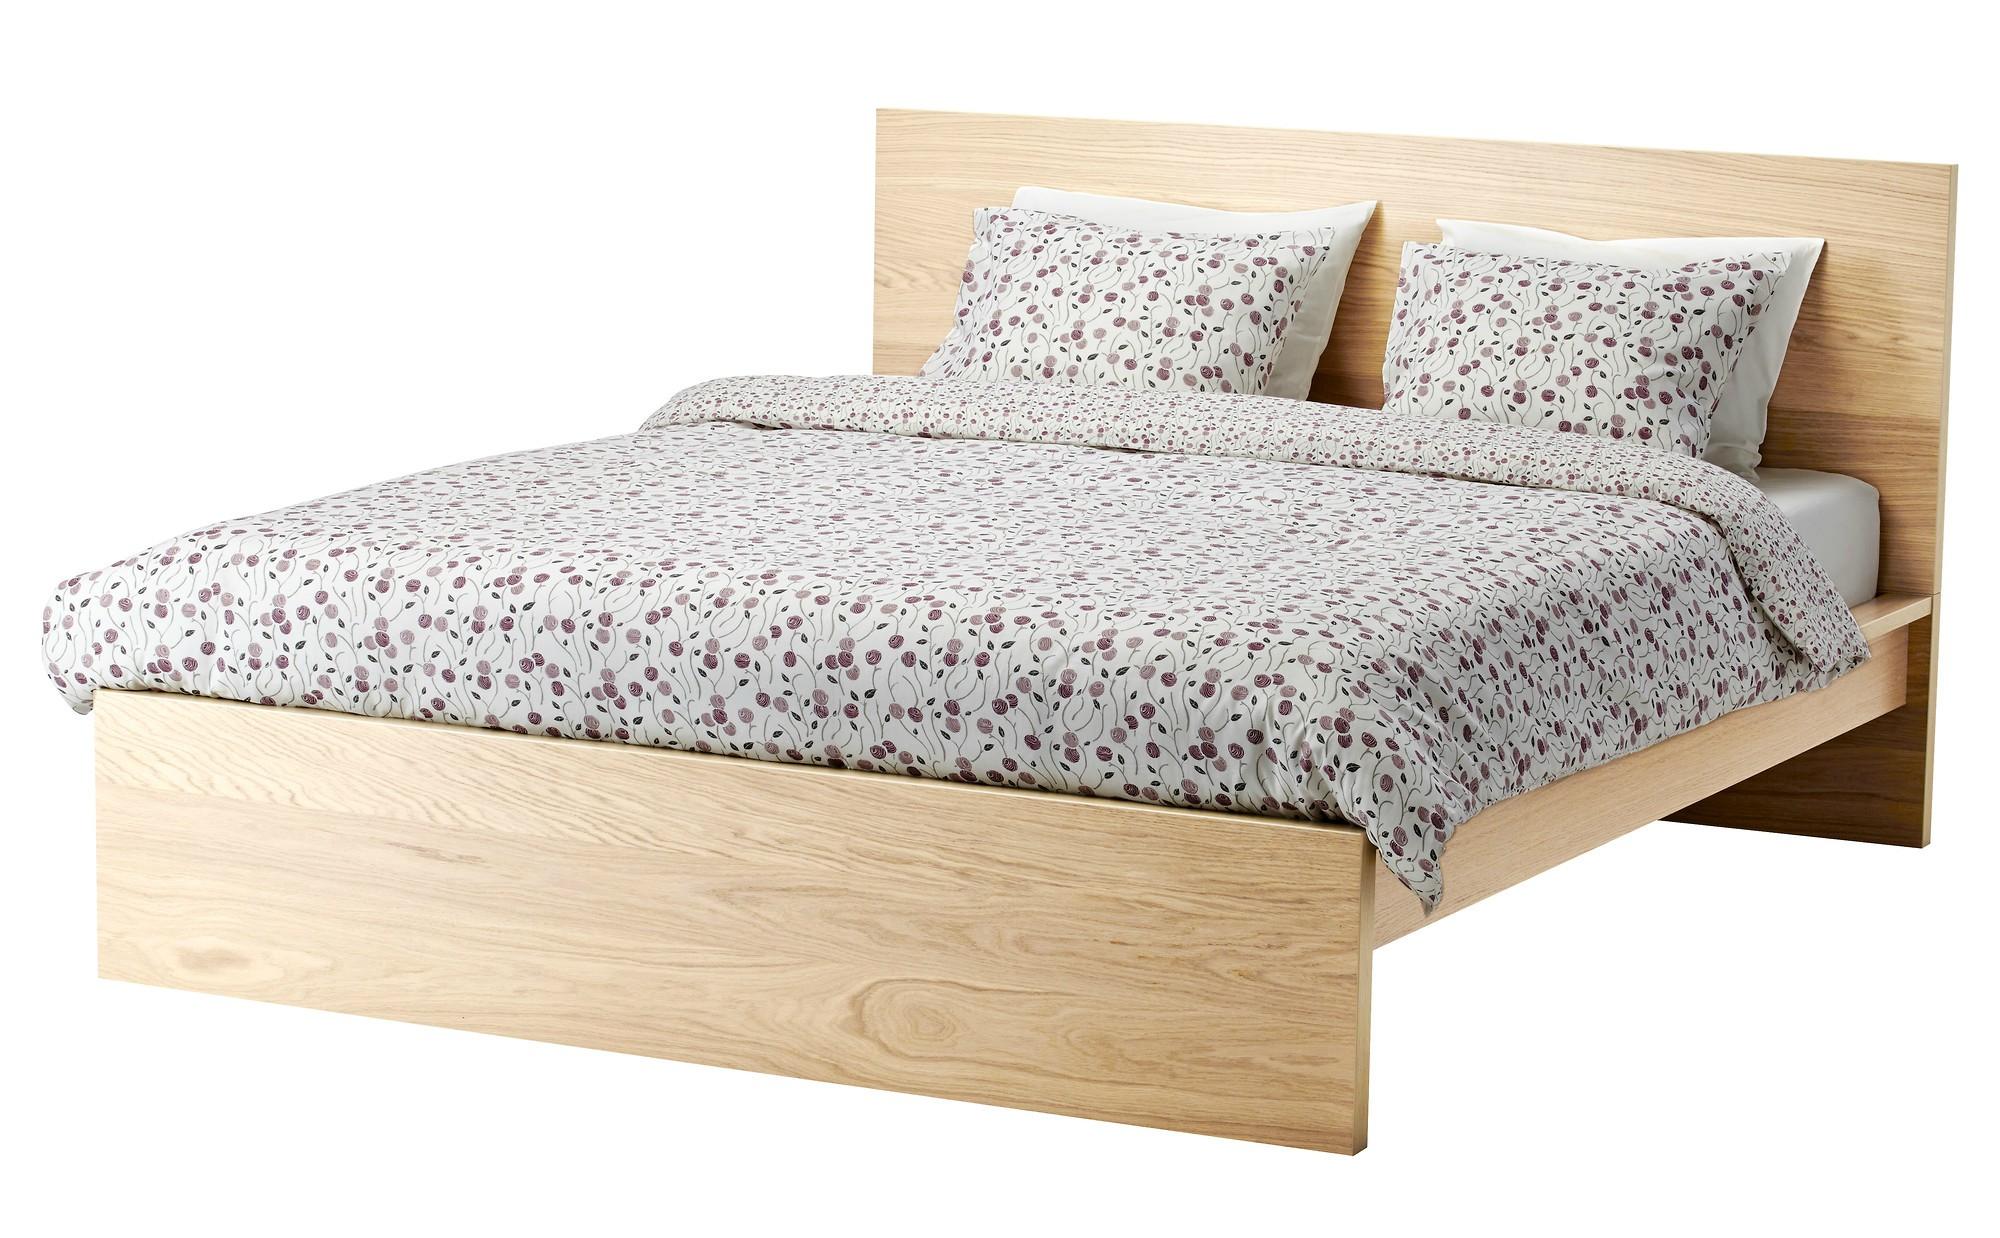 Astounding The Beautiful Upgrades Your Ikea Malm Bed Deserves Customarchery Wood Chair Design Ideas Customarcherynet